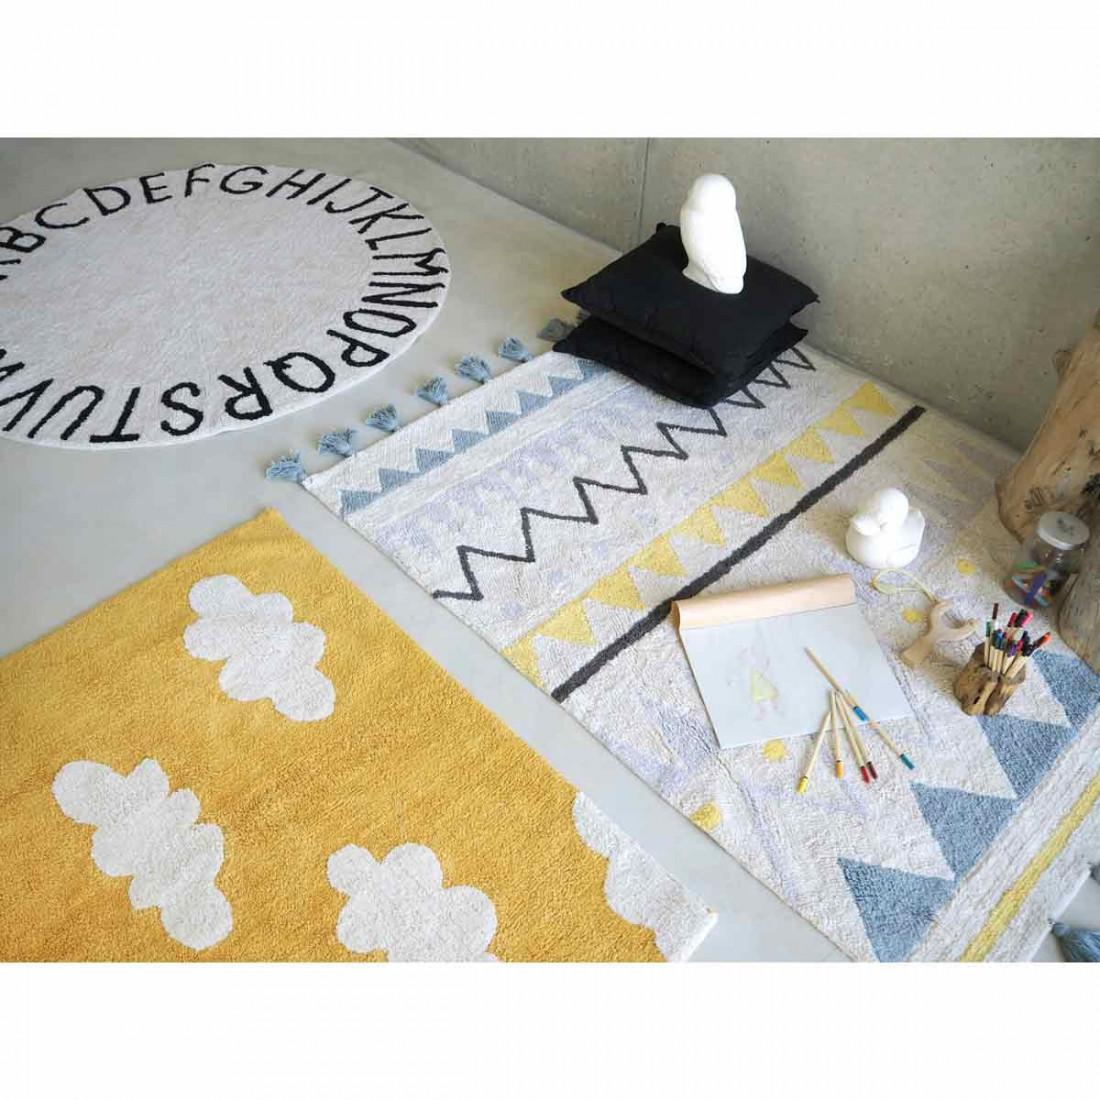 tapis enfant coton lavable jaune moutarde nuages blanc lorena canals ma chambramoi. Black Bedroom Furniture Sets. Home Design Ideas